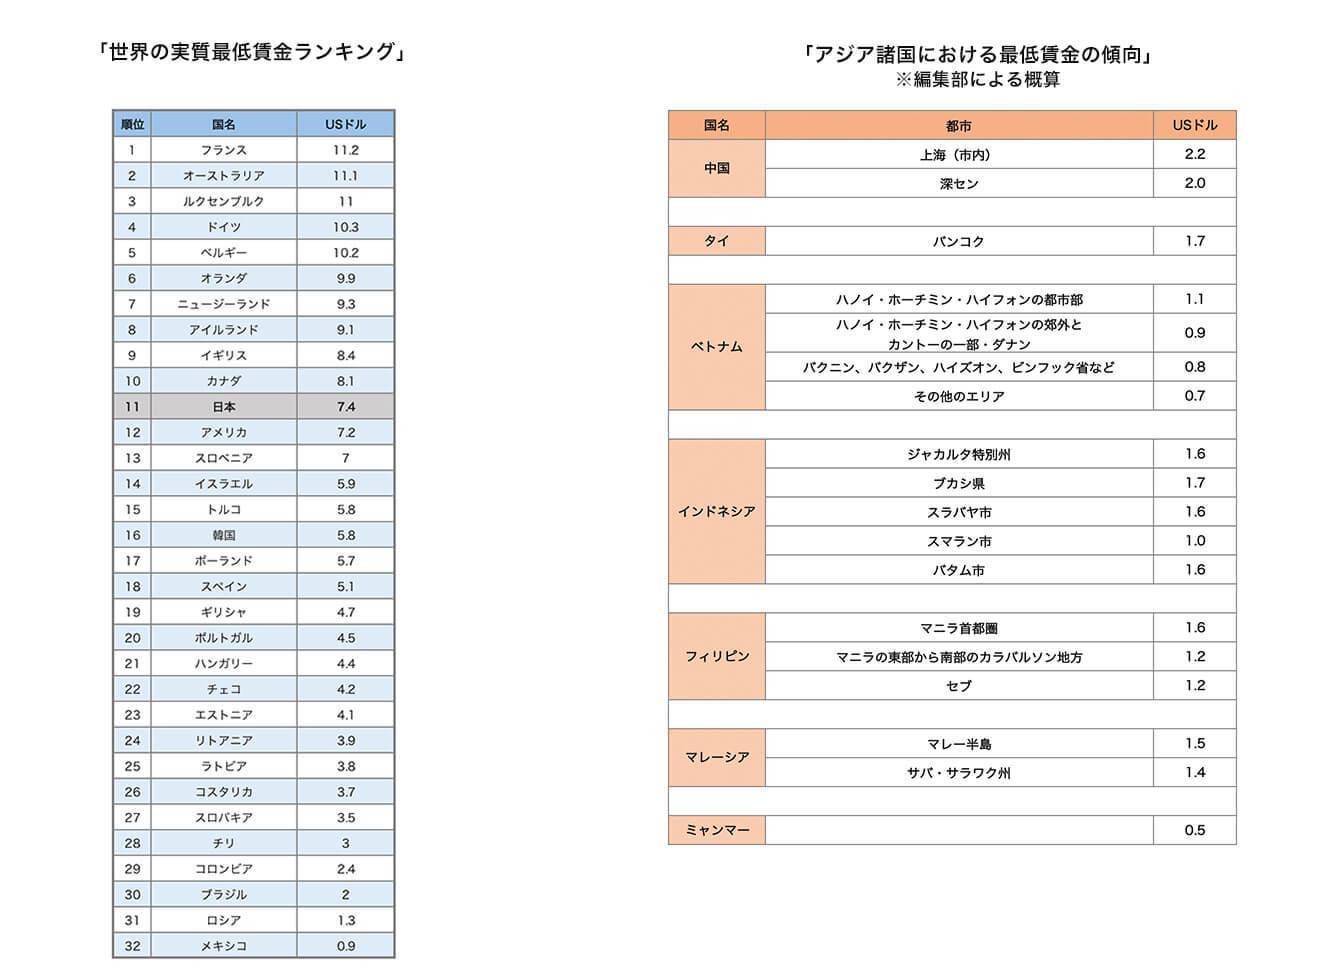 AIG「専門家の指導の下、安全に実施しています」:AIGのCMと日本人の最低賃金→俺「未来予測が世界を制する!」_a0348309_15080894.jpg